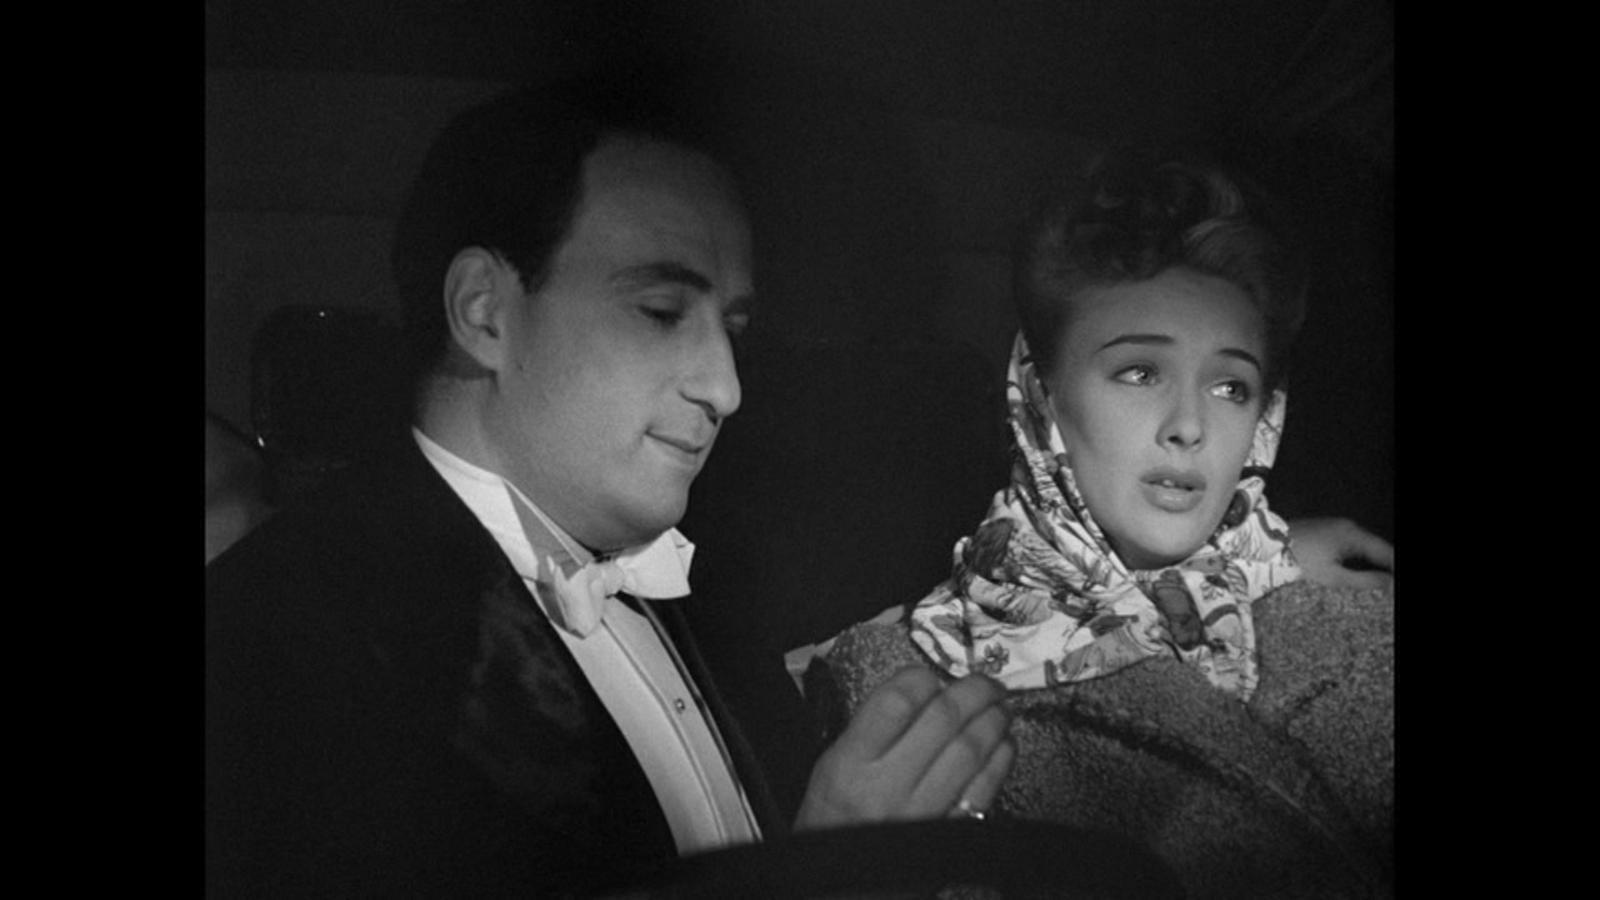 Susan Shaw and Sydney Tafler in It Always Rains on Sunday (1947)